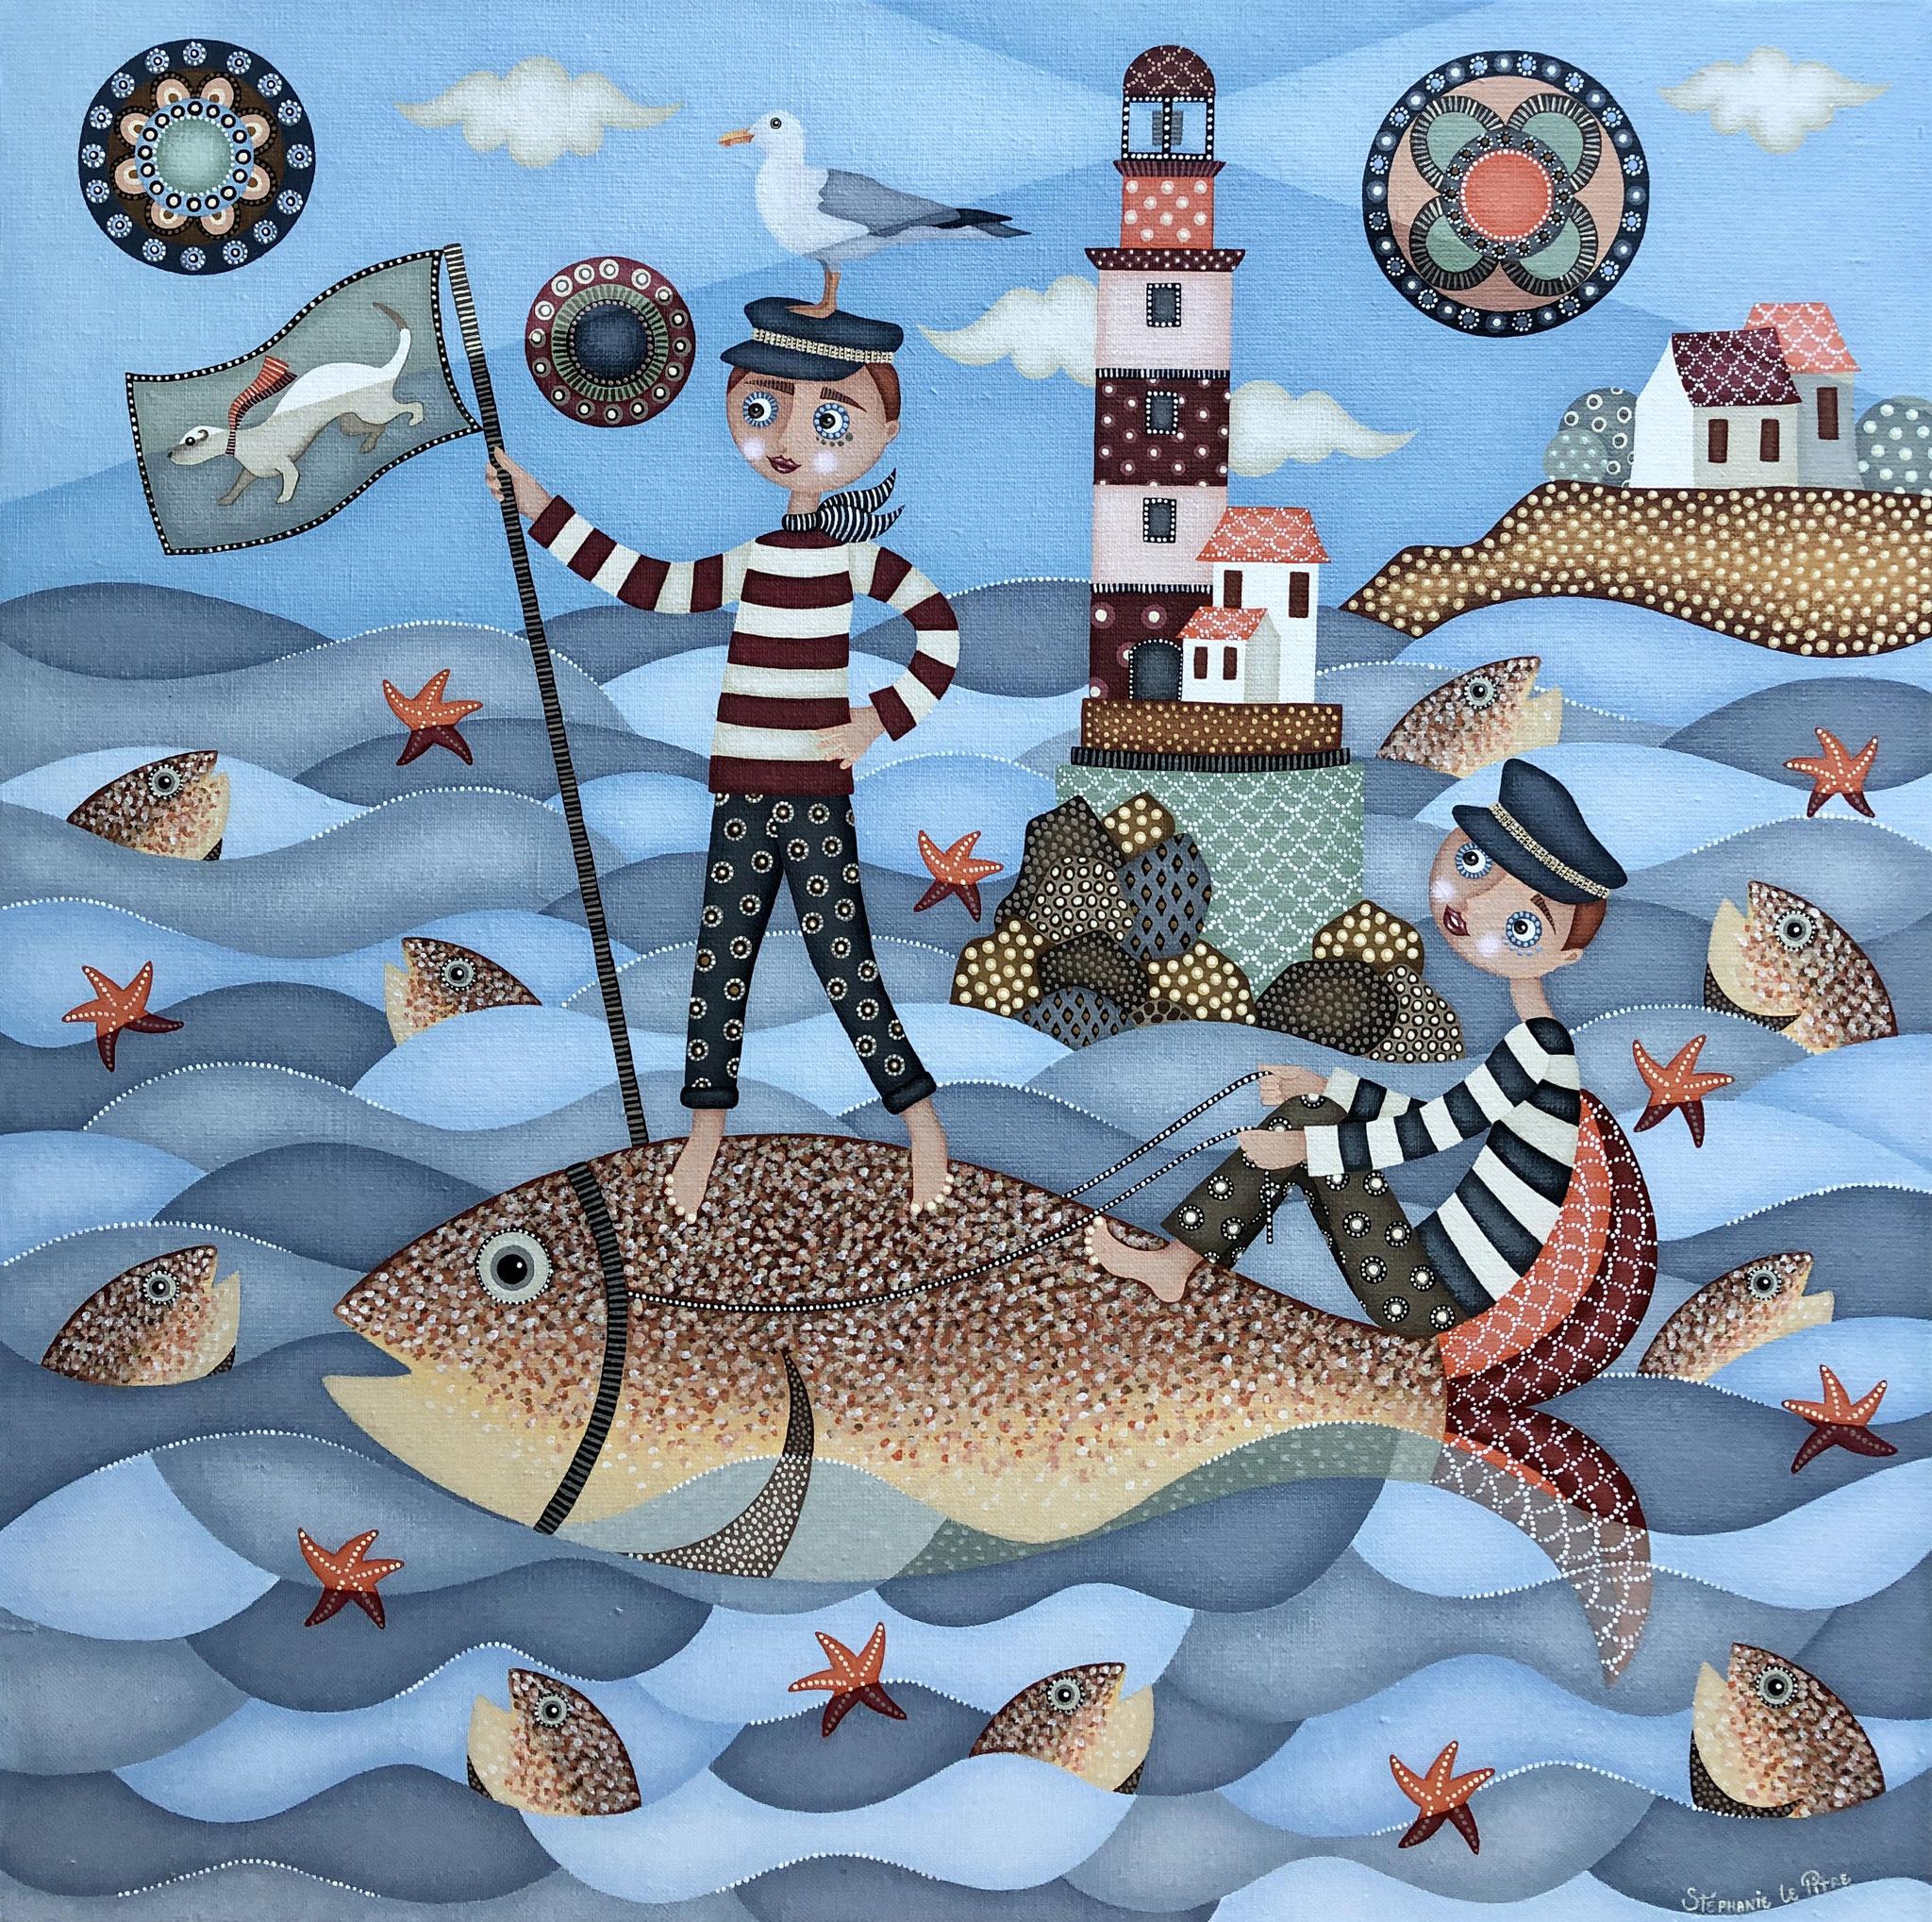 La Pêche au Gros (60 x 60)